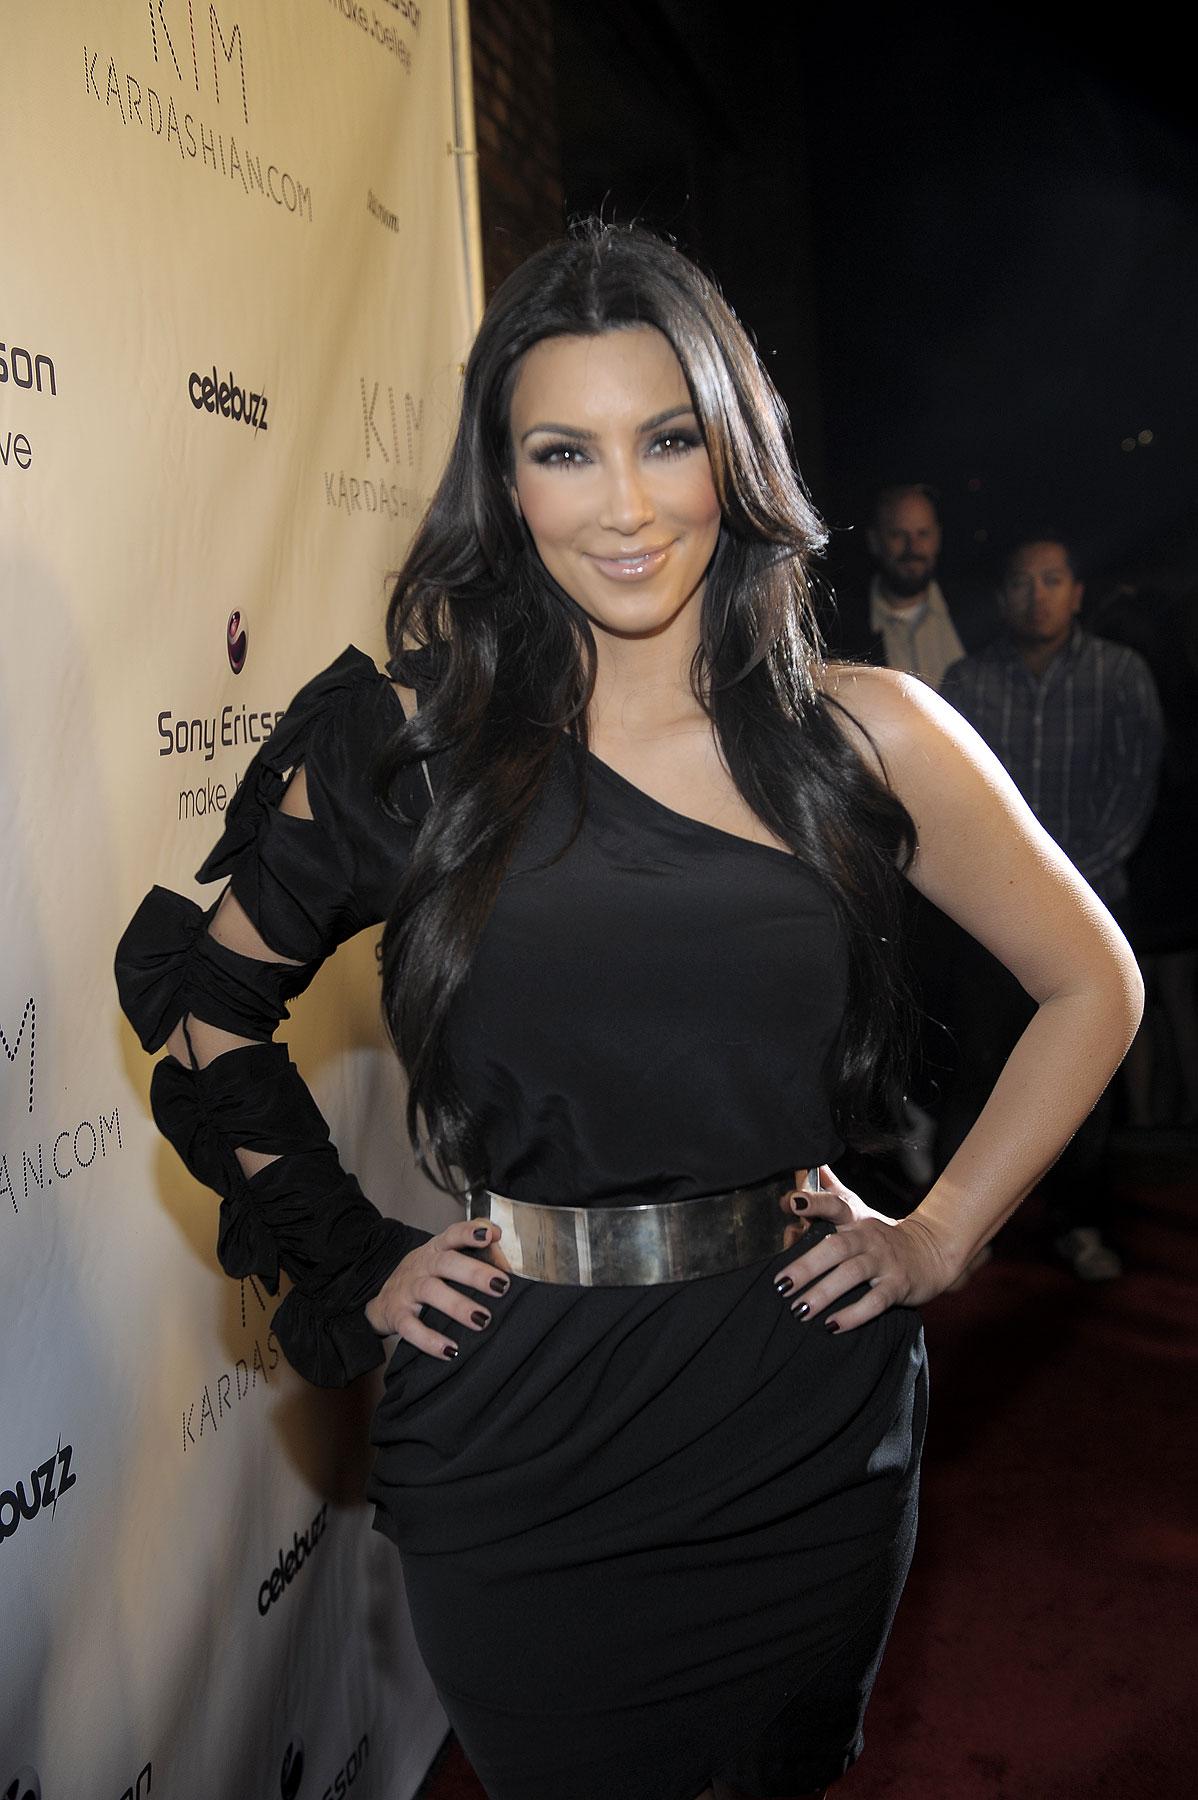 Kim Kardashian Relaunches Her #1 Blog (PHOTOS)